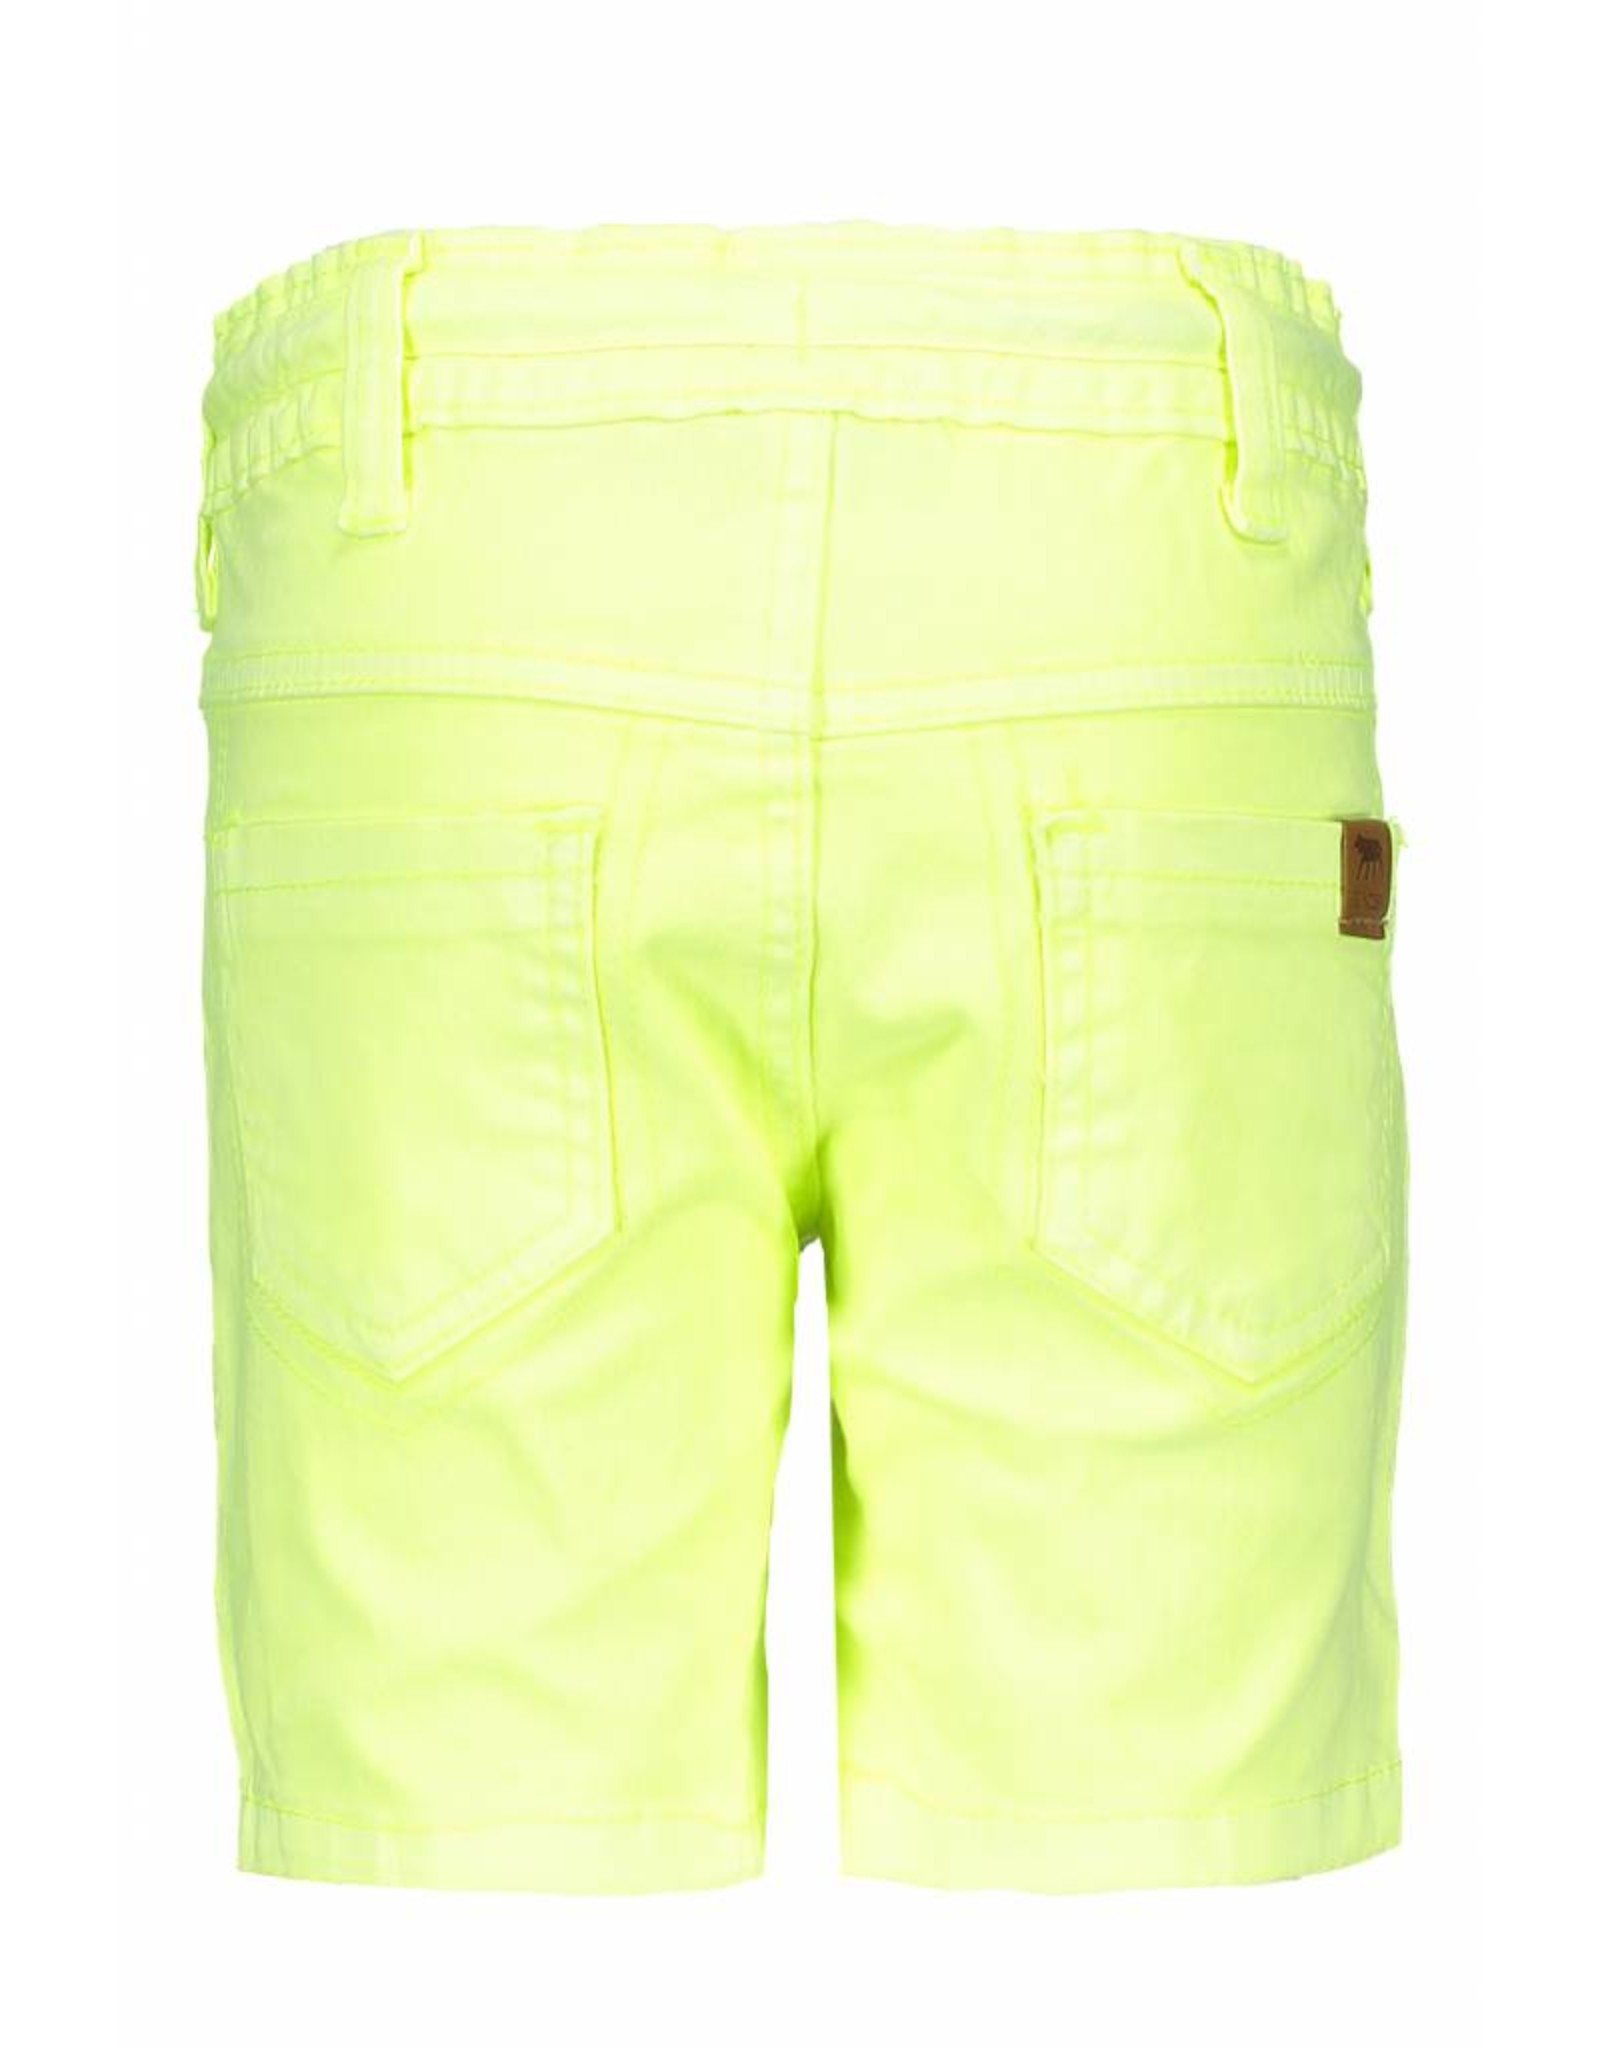 B.Nosy B.Nosy Boys Garment Dye Short-Neon Yellow